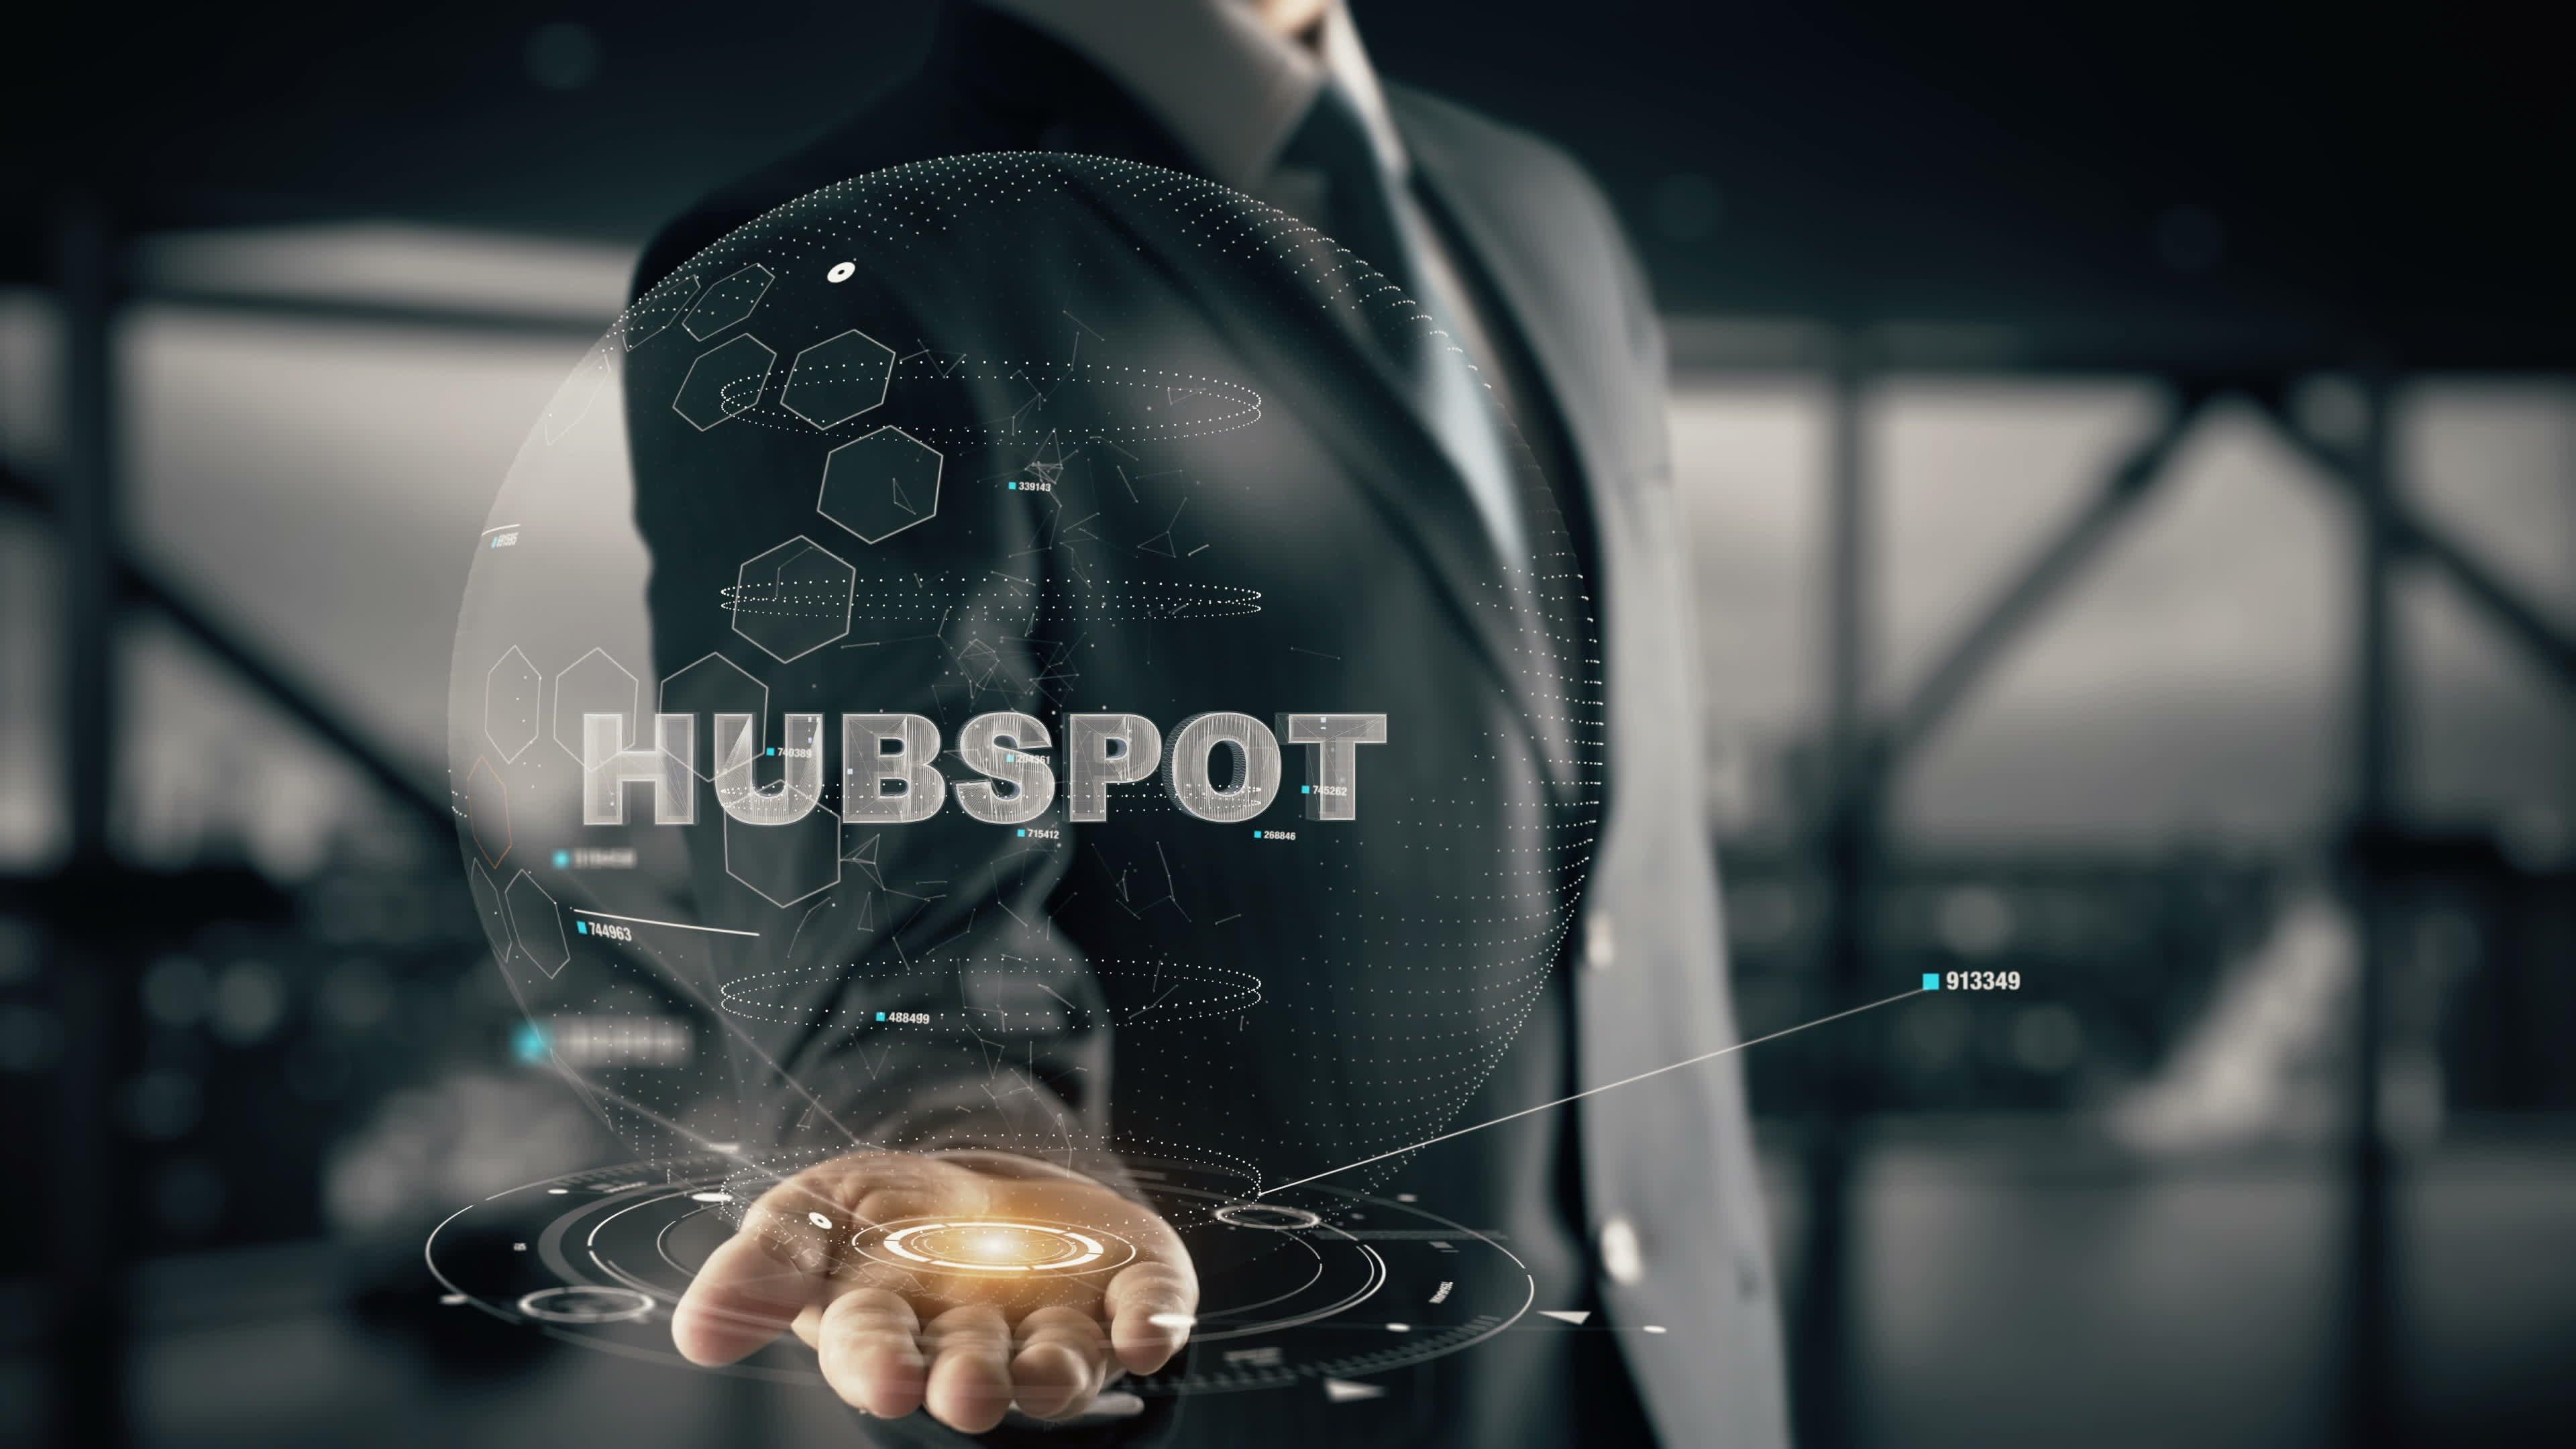 Hubspotと連携できる外部サービス一覧【2020年最新版】